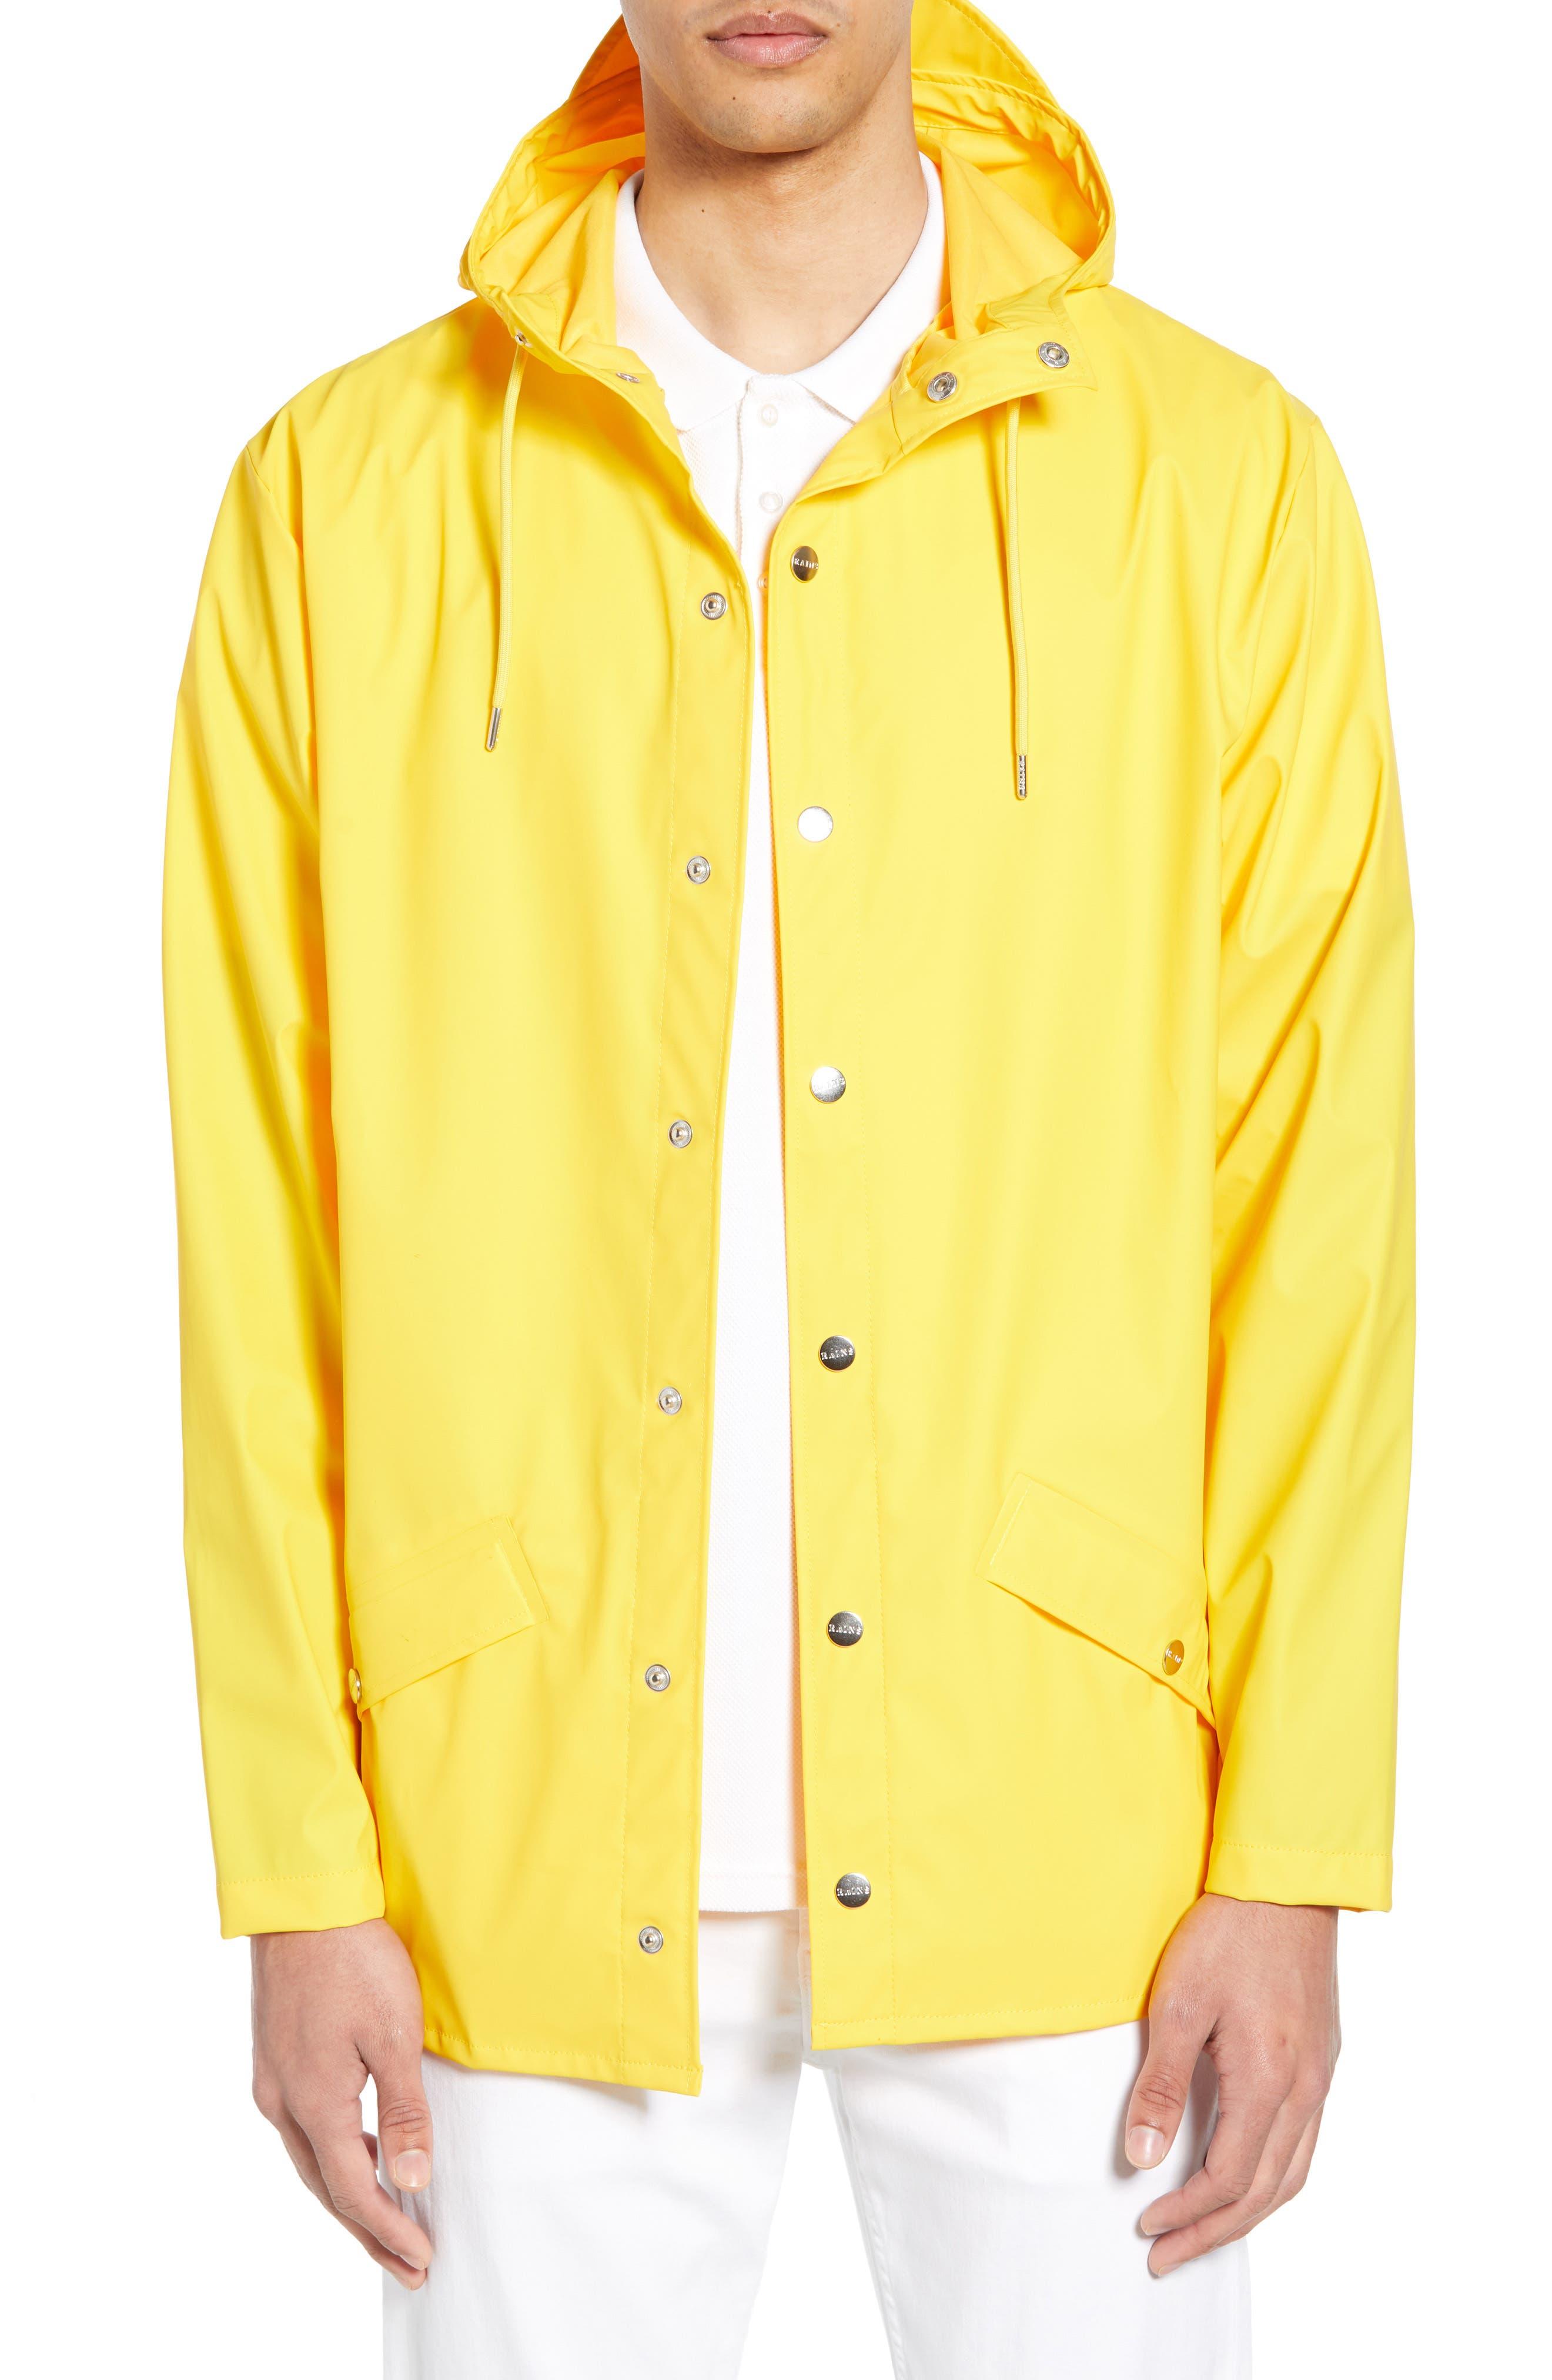 Rains Lightweight Hooded Rain Jacket, Yellow